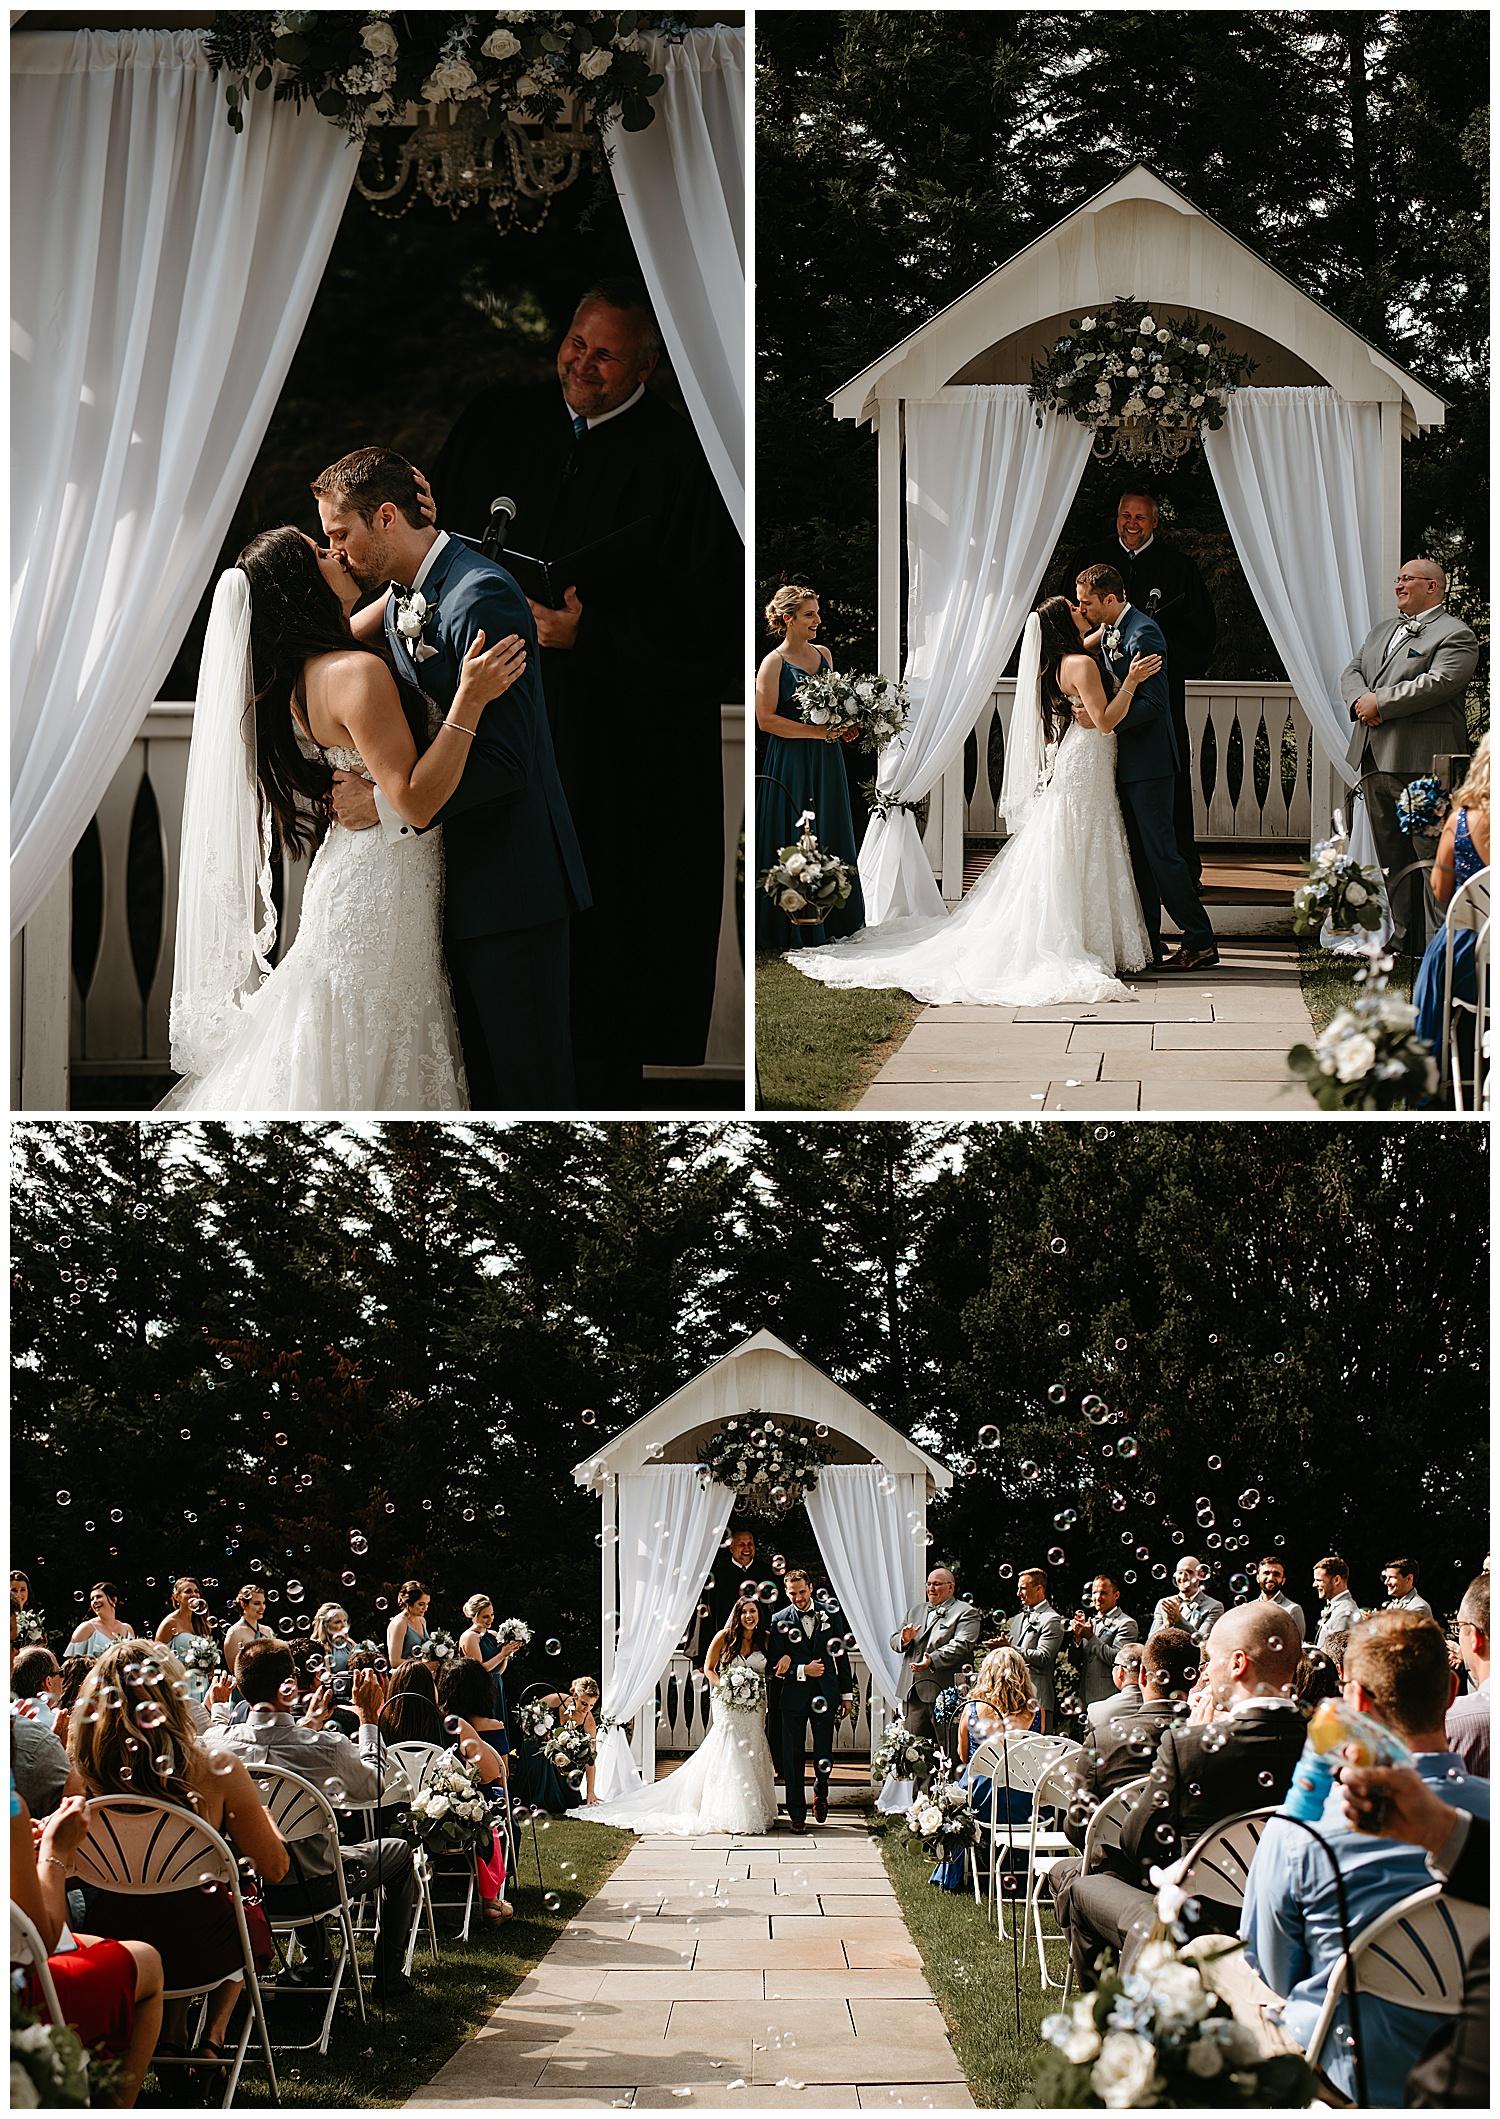 NEPA-Bloomsburg-Wedding-Photographer-at-The-Barn-at-Boones-Dam-Bloomsburg-PA_0035.jpg